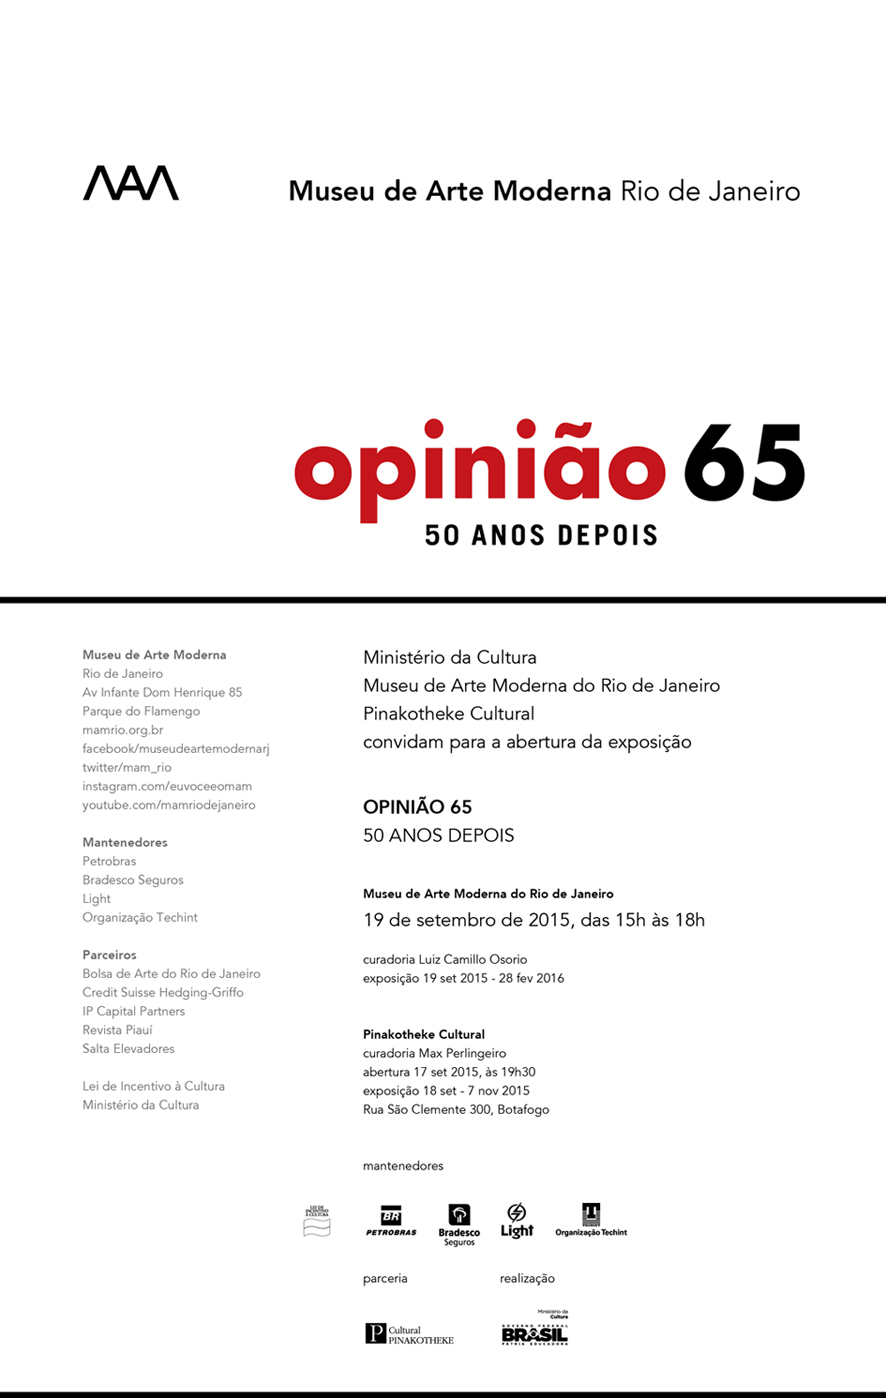 opiniao65_conviteeletronico